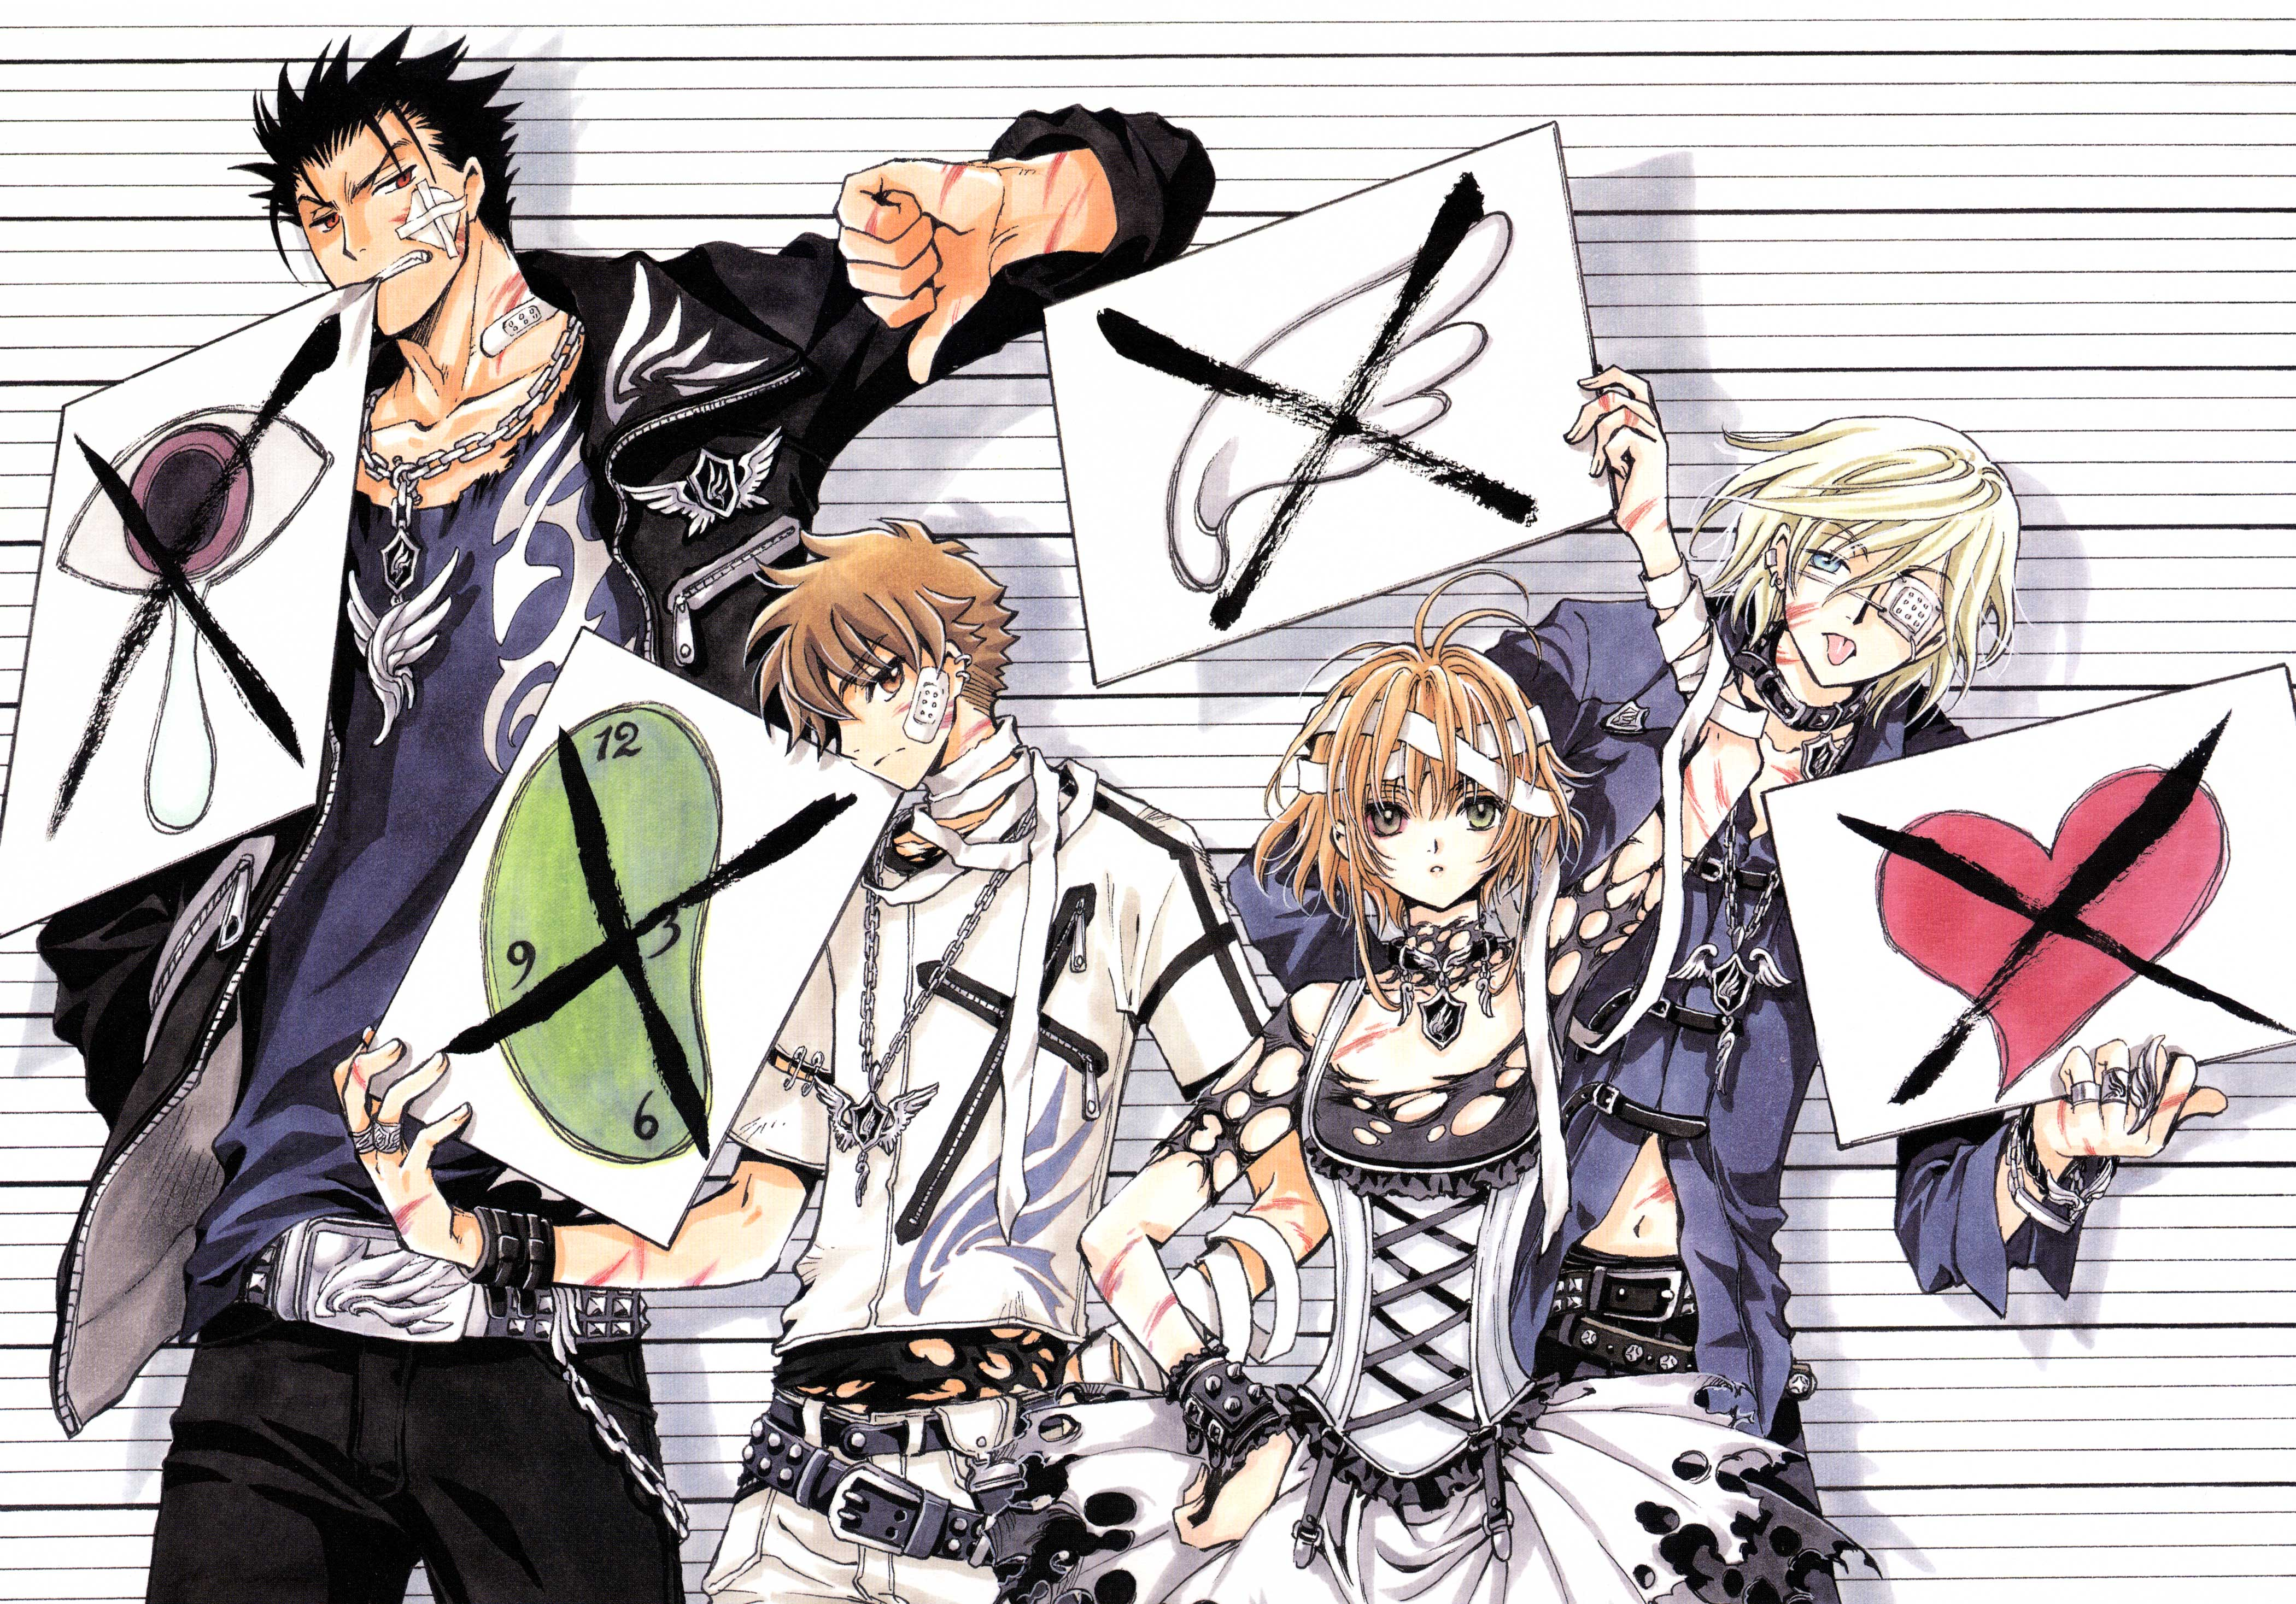 Hit or Miss? Version manga - animé - Page 5 Tsubasa%3A.RESERVoir.CHRoNiCLE.full.356274